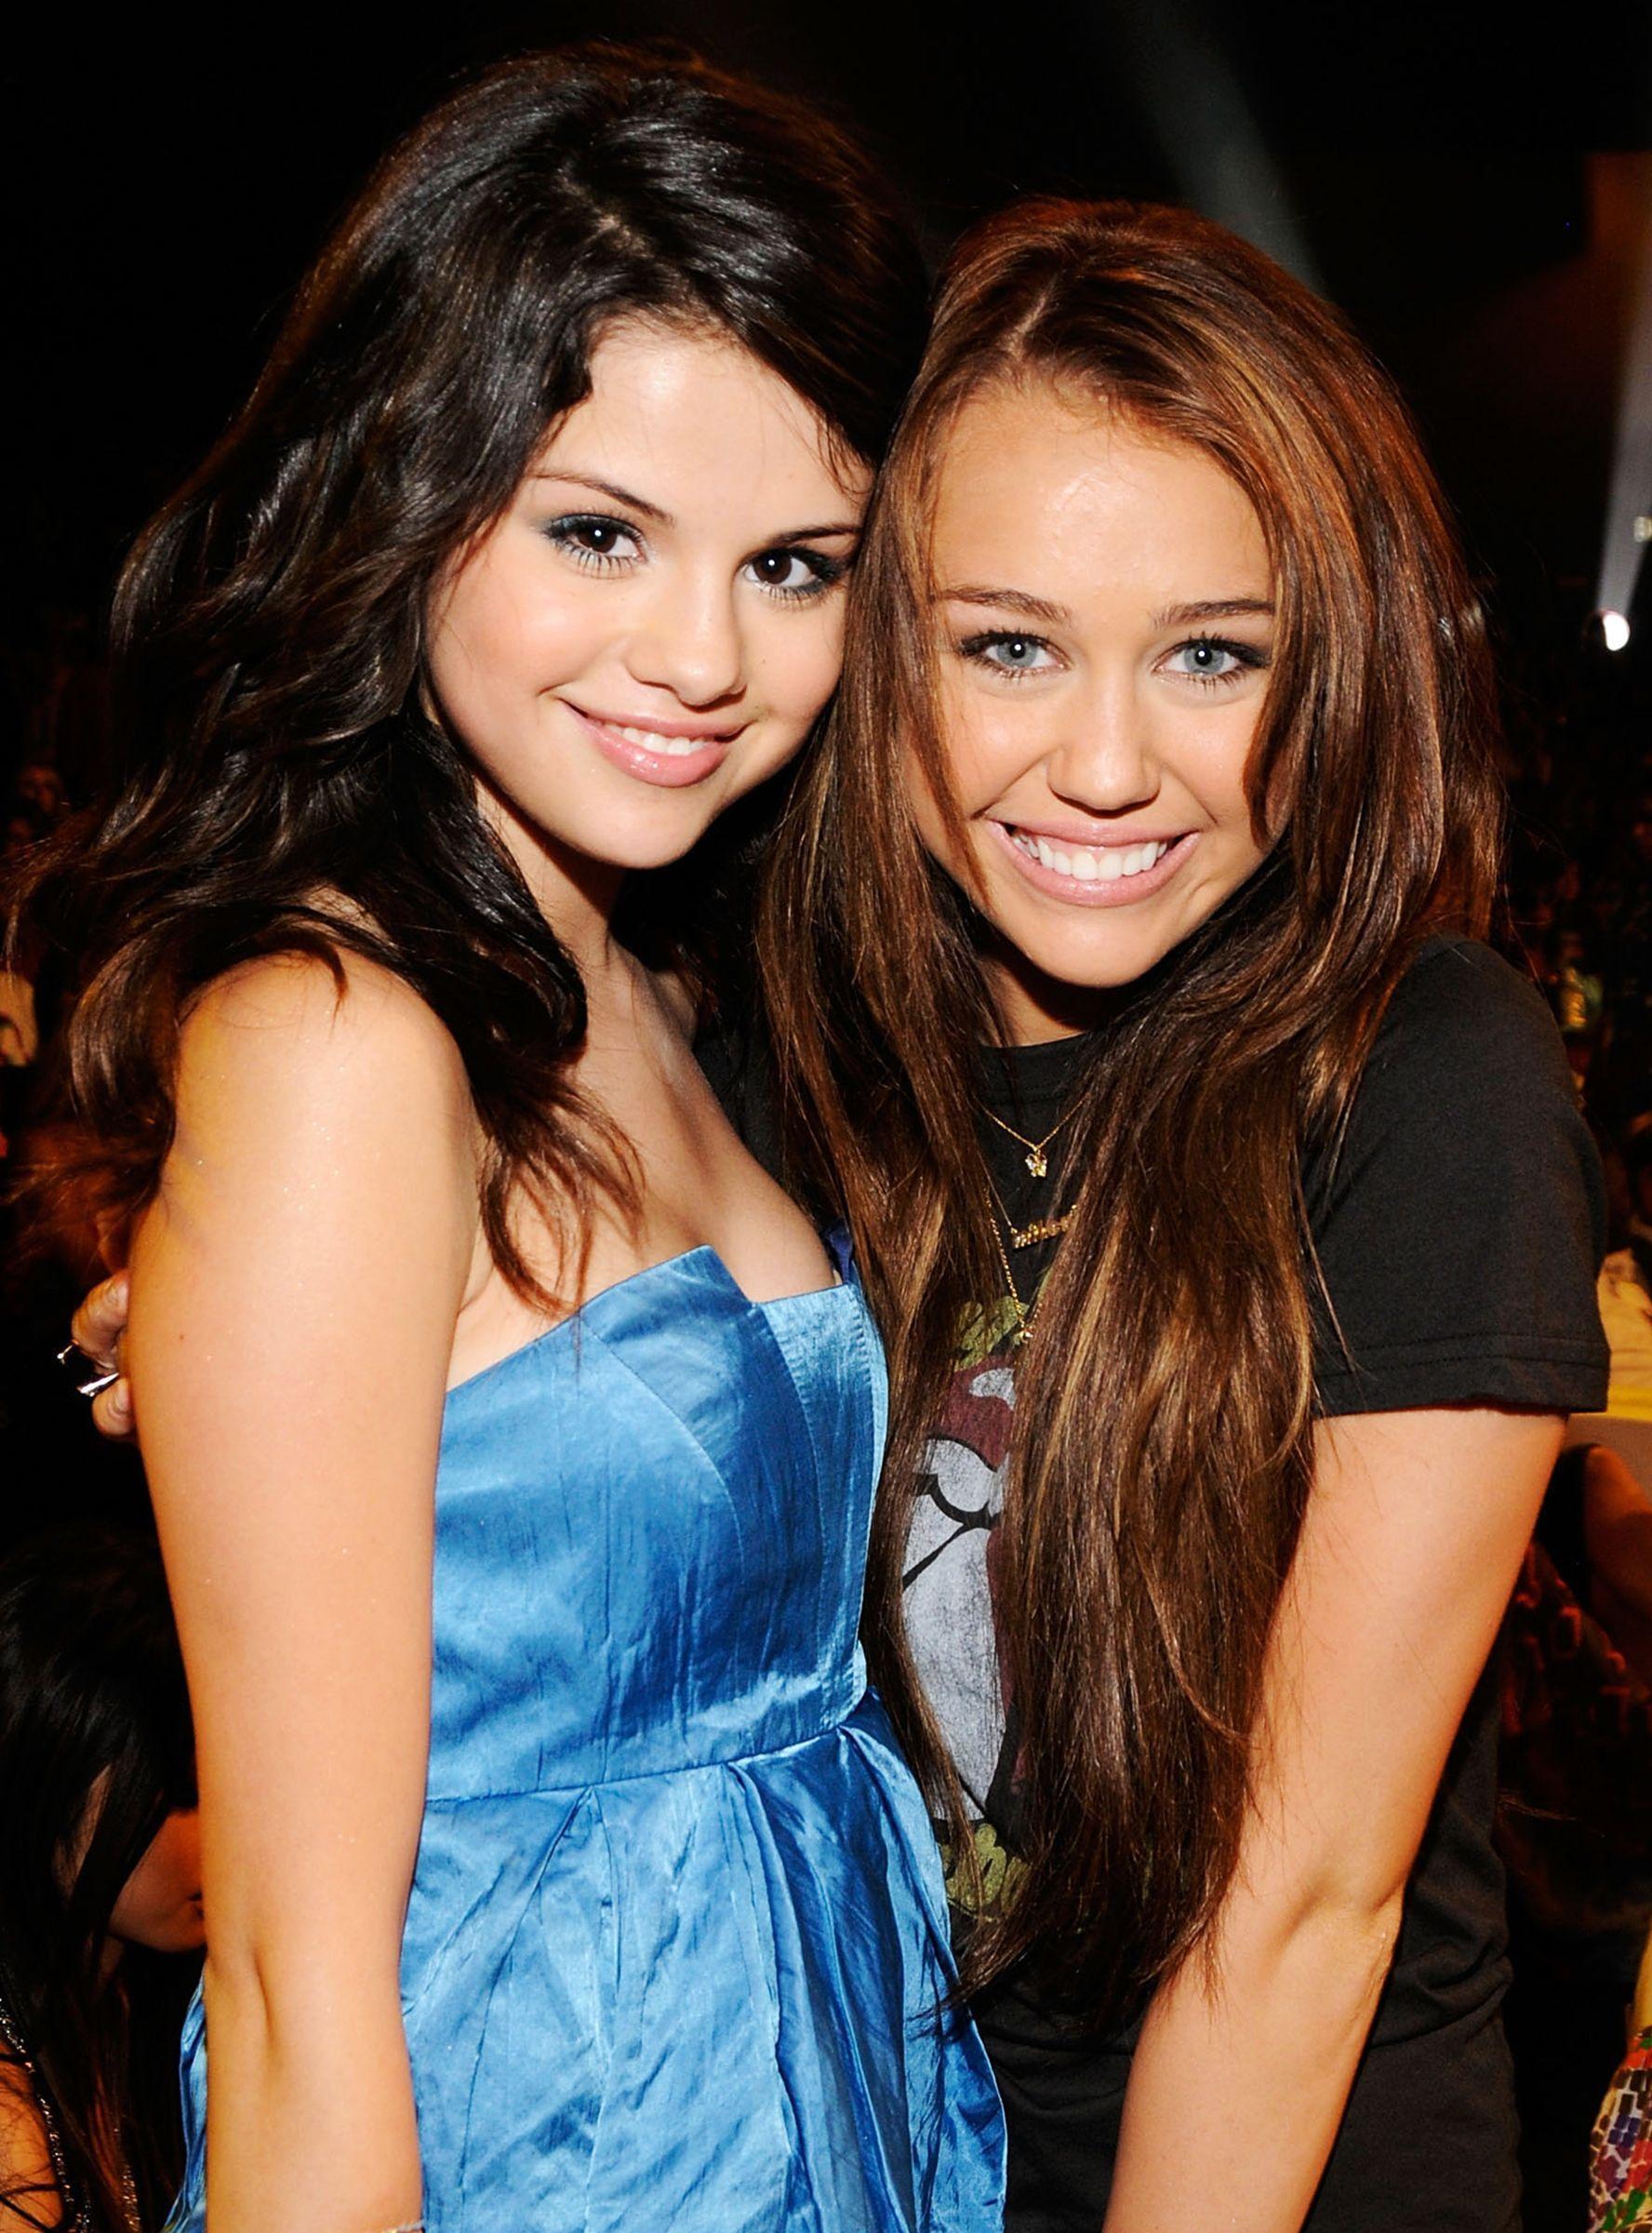 Why Miley Cyrus Is Defending Selena Gomez On Instagram | Selena gomez miley  cyrus, Miley cyrus, Selena gomez